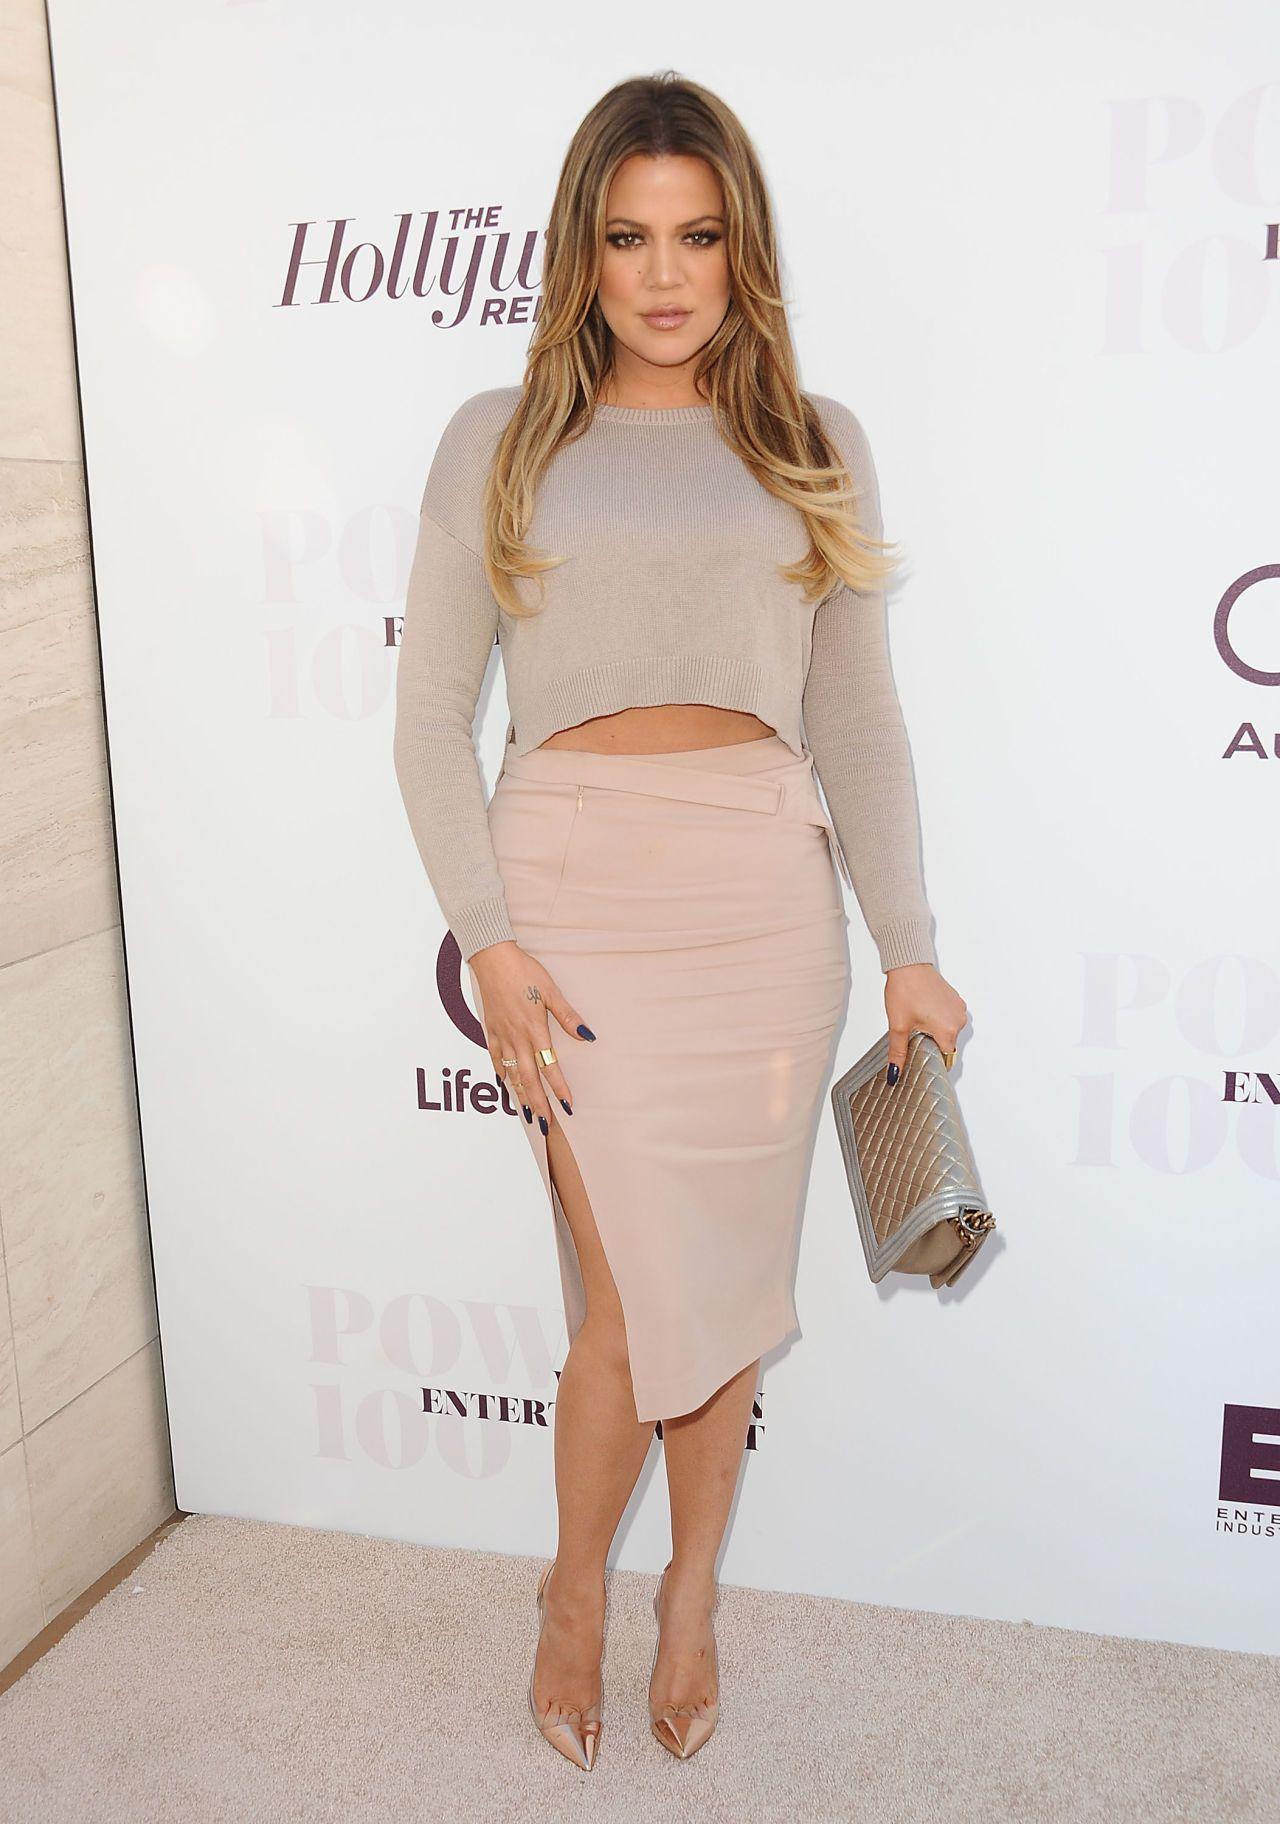 Fiercebook :: แฟชั่นสุดแซ่บจาก 7 สาว Kardashian - Jenner! http://goo.gl/EJdpNM